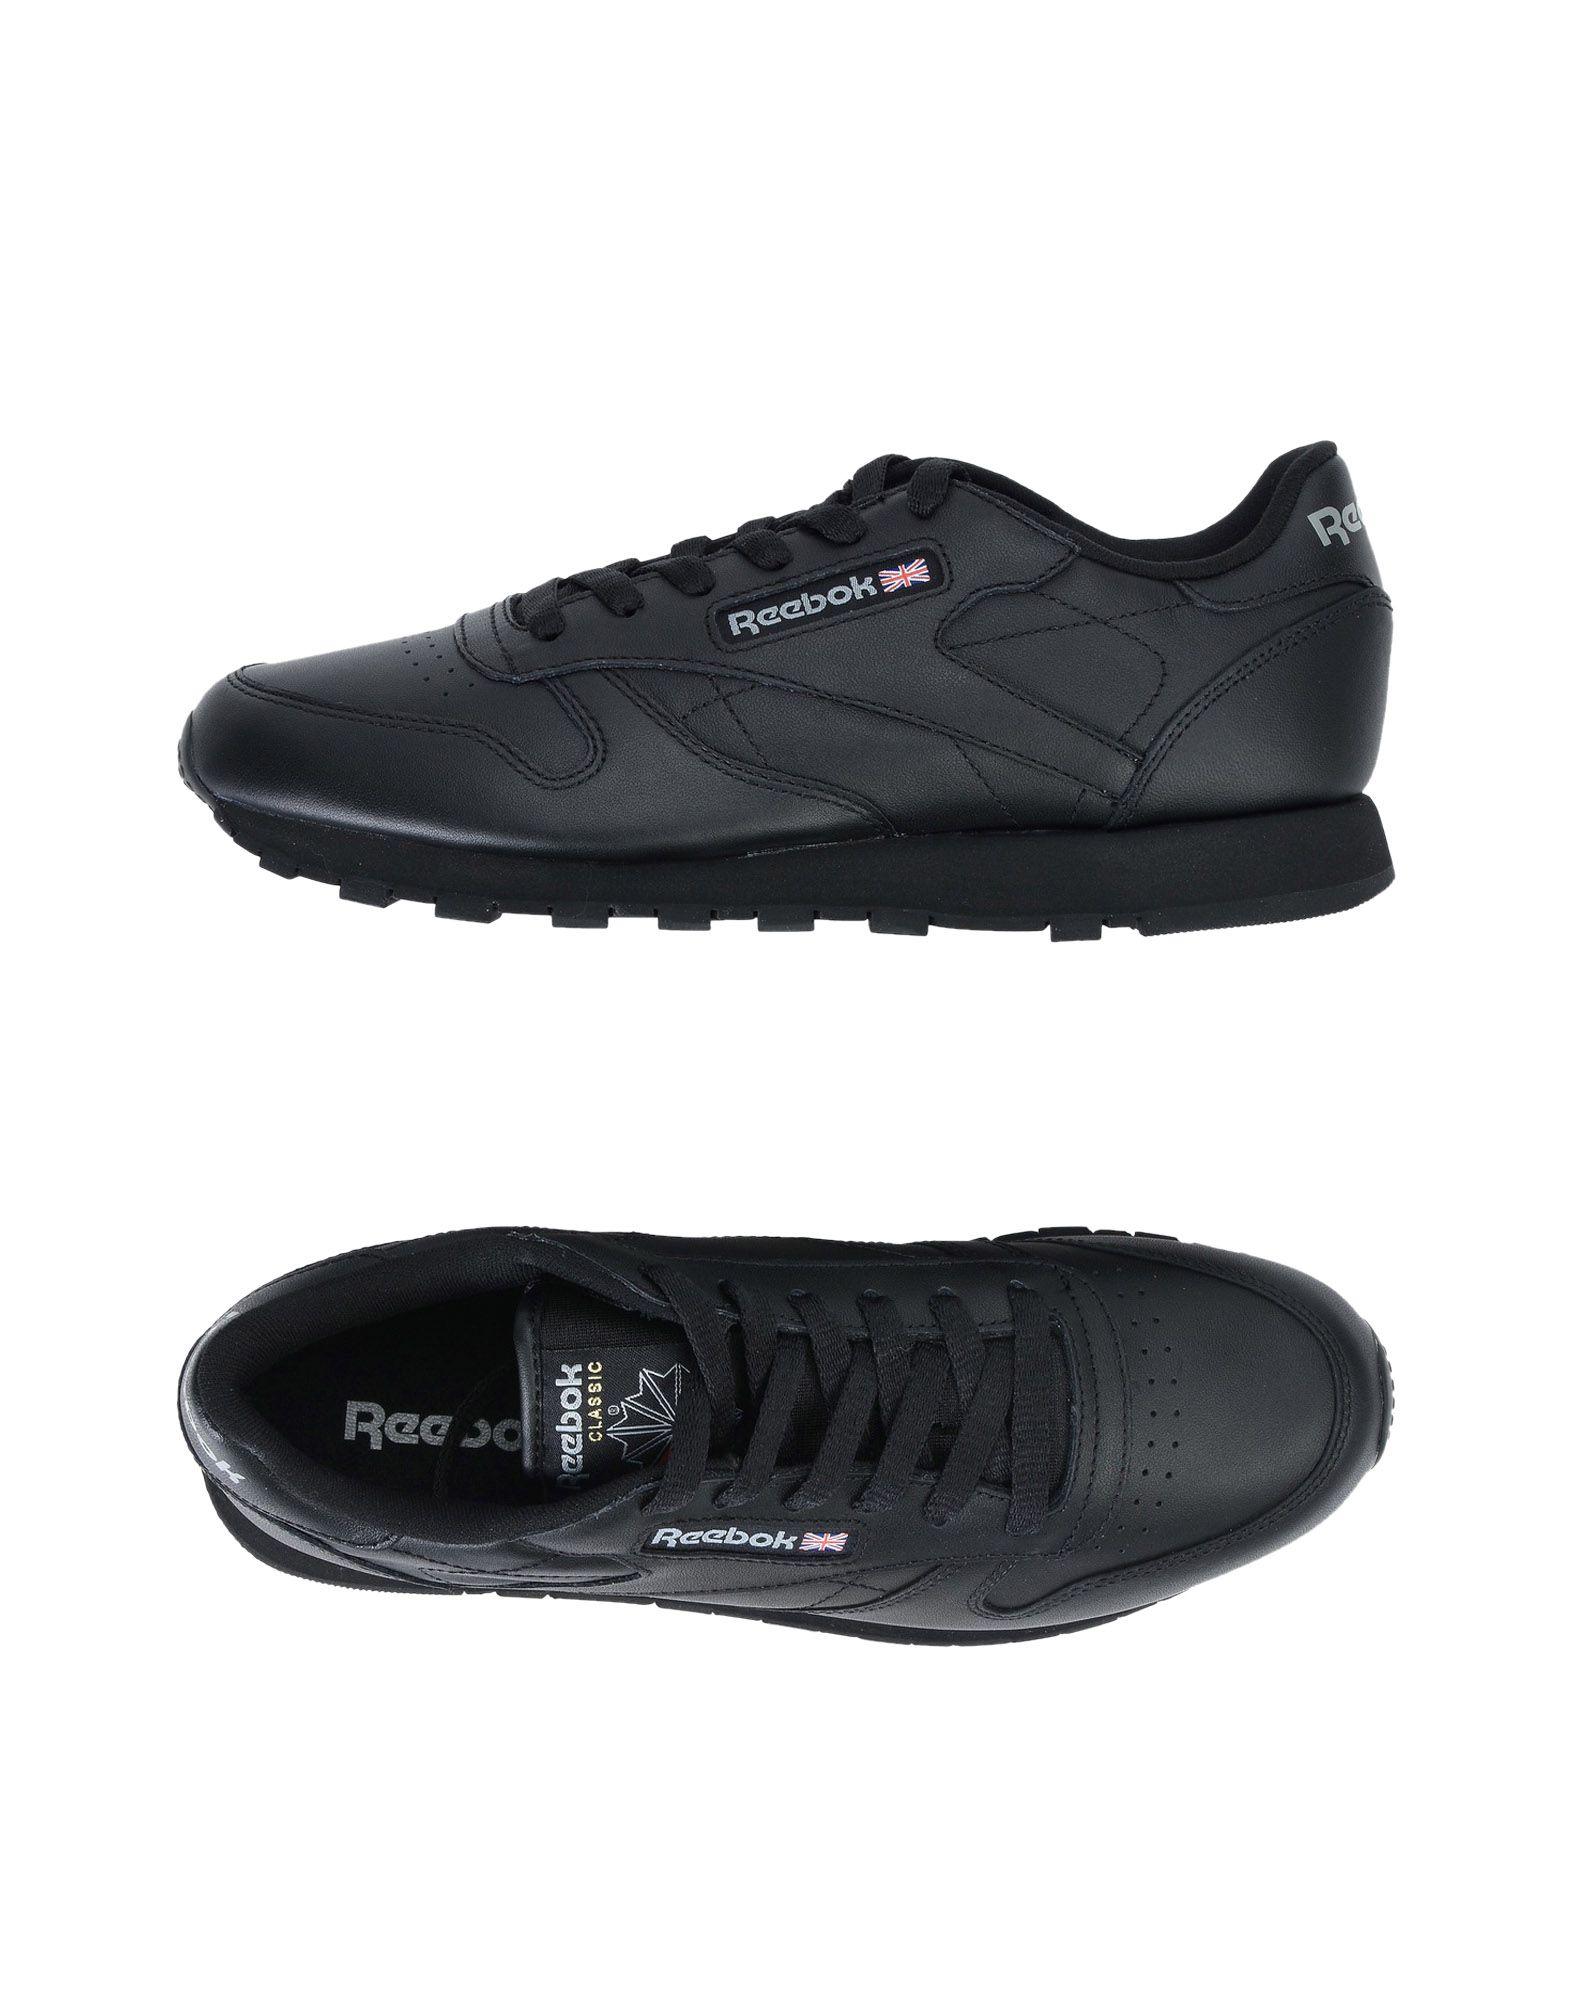 Sneakers Reebok Cl Lthr - Femme - Sneakers Reebok sur